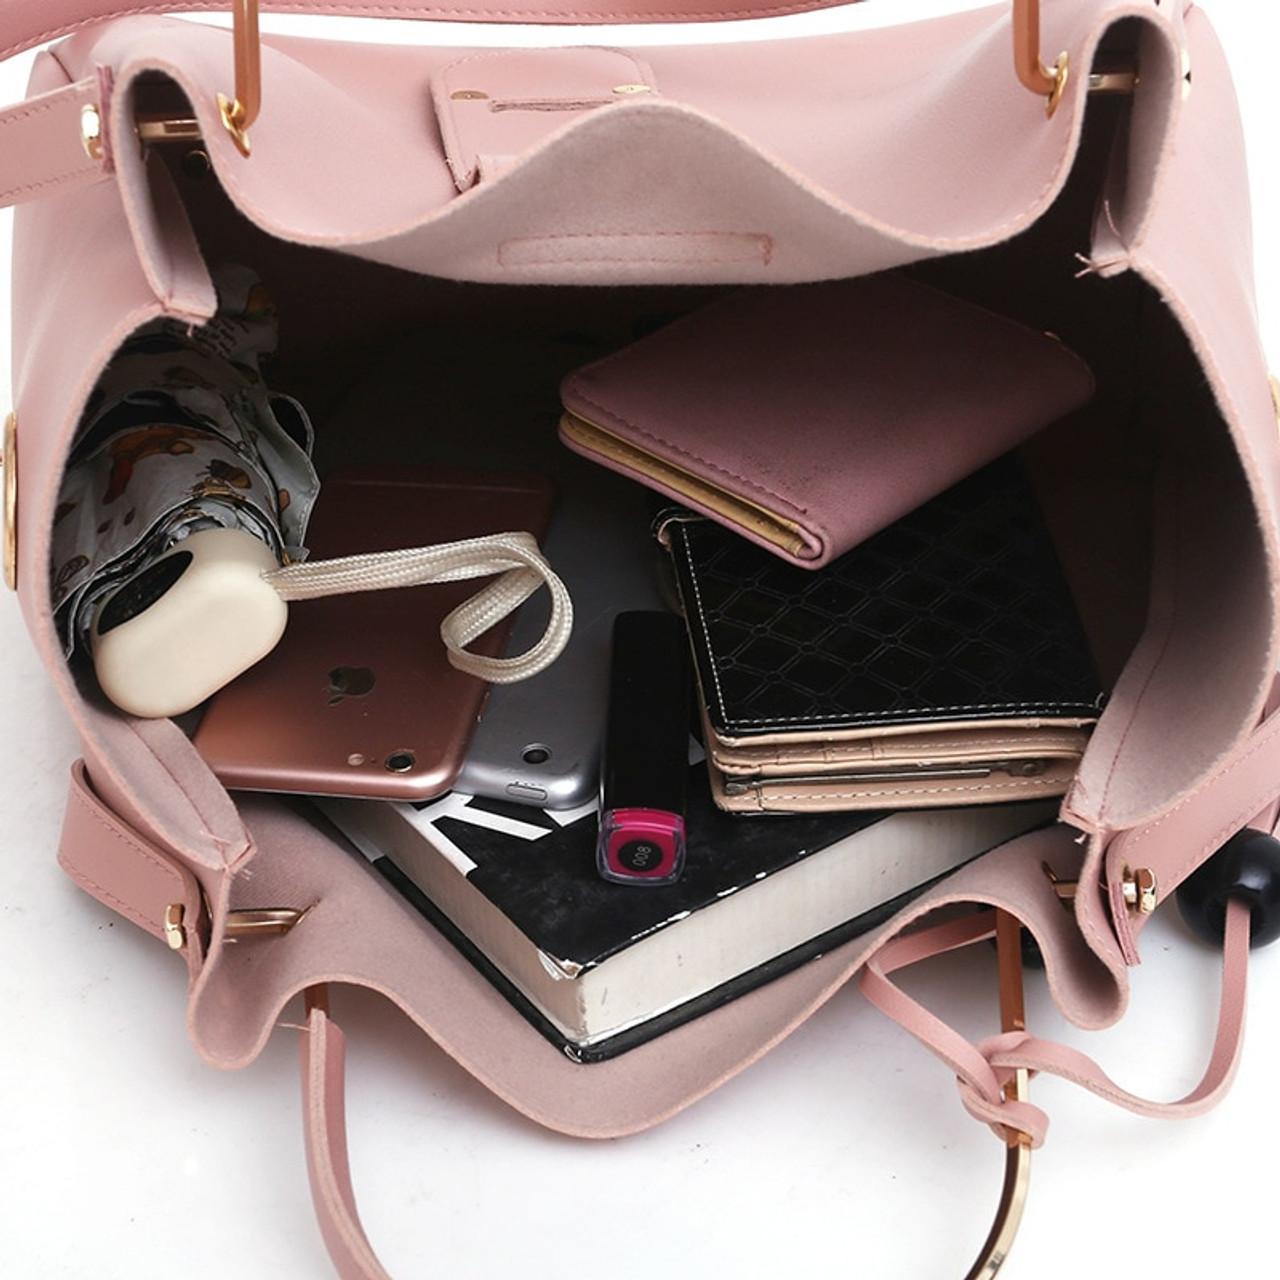 d7fe8d5d55 ... 3Pcs/Sets Women Handbags Leather Shoulder Bags Female Large Capacity  Casual Tote Bag Tassel Bucket ...